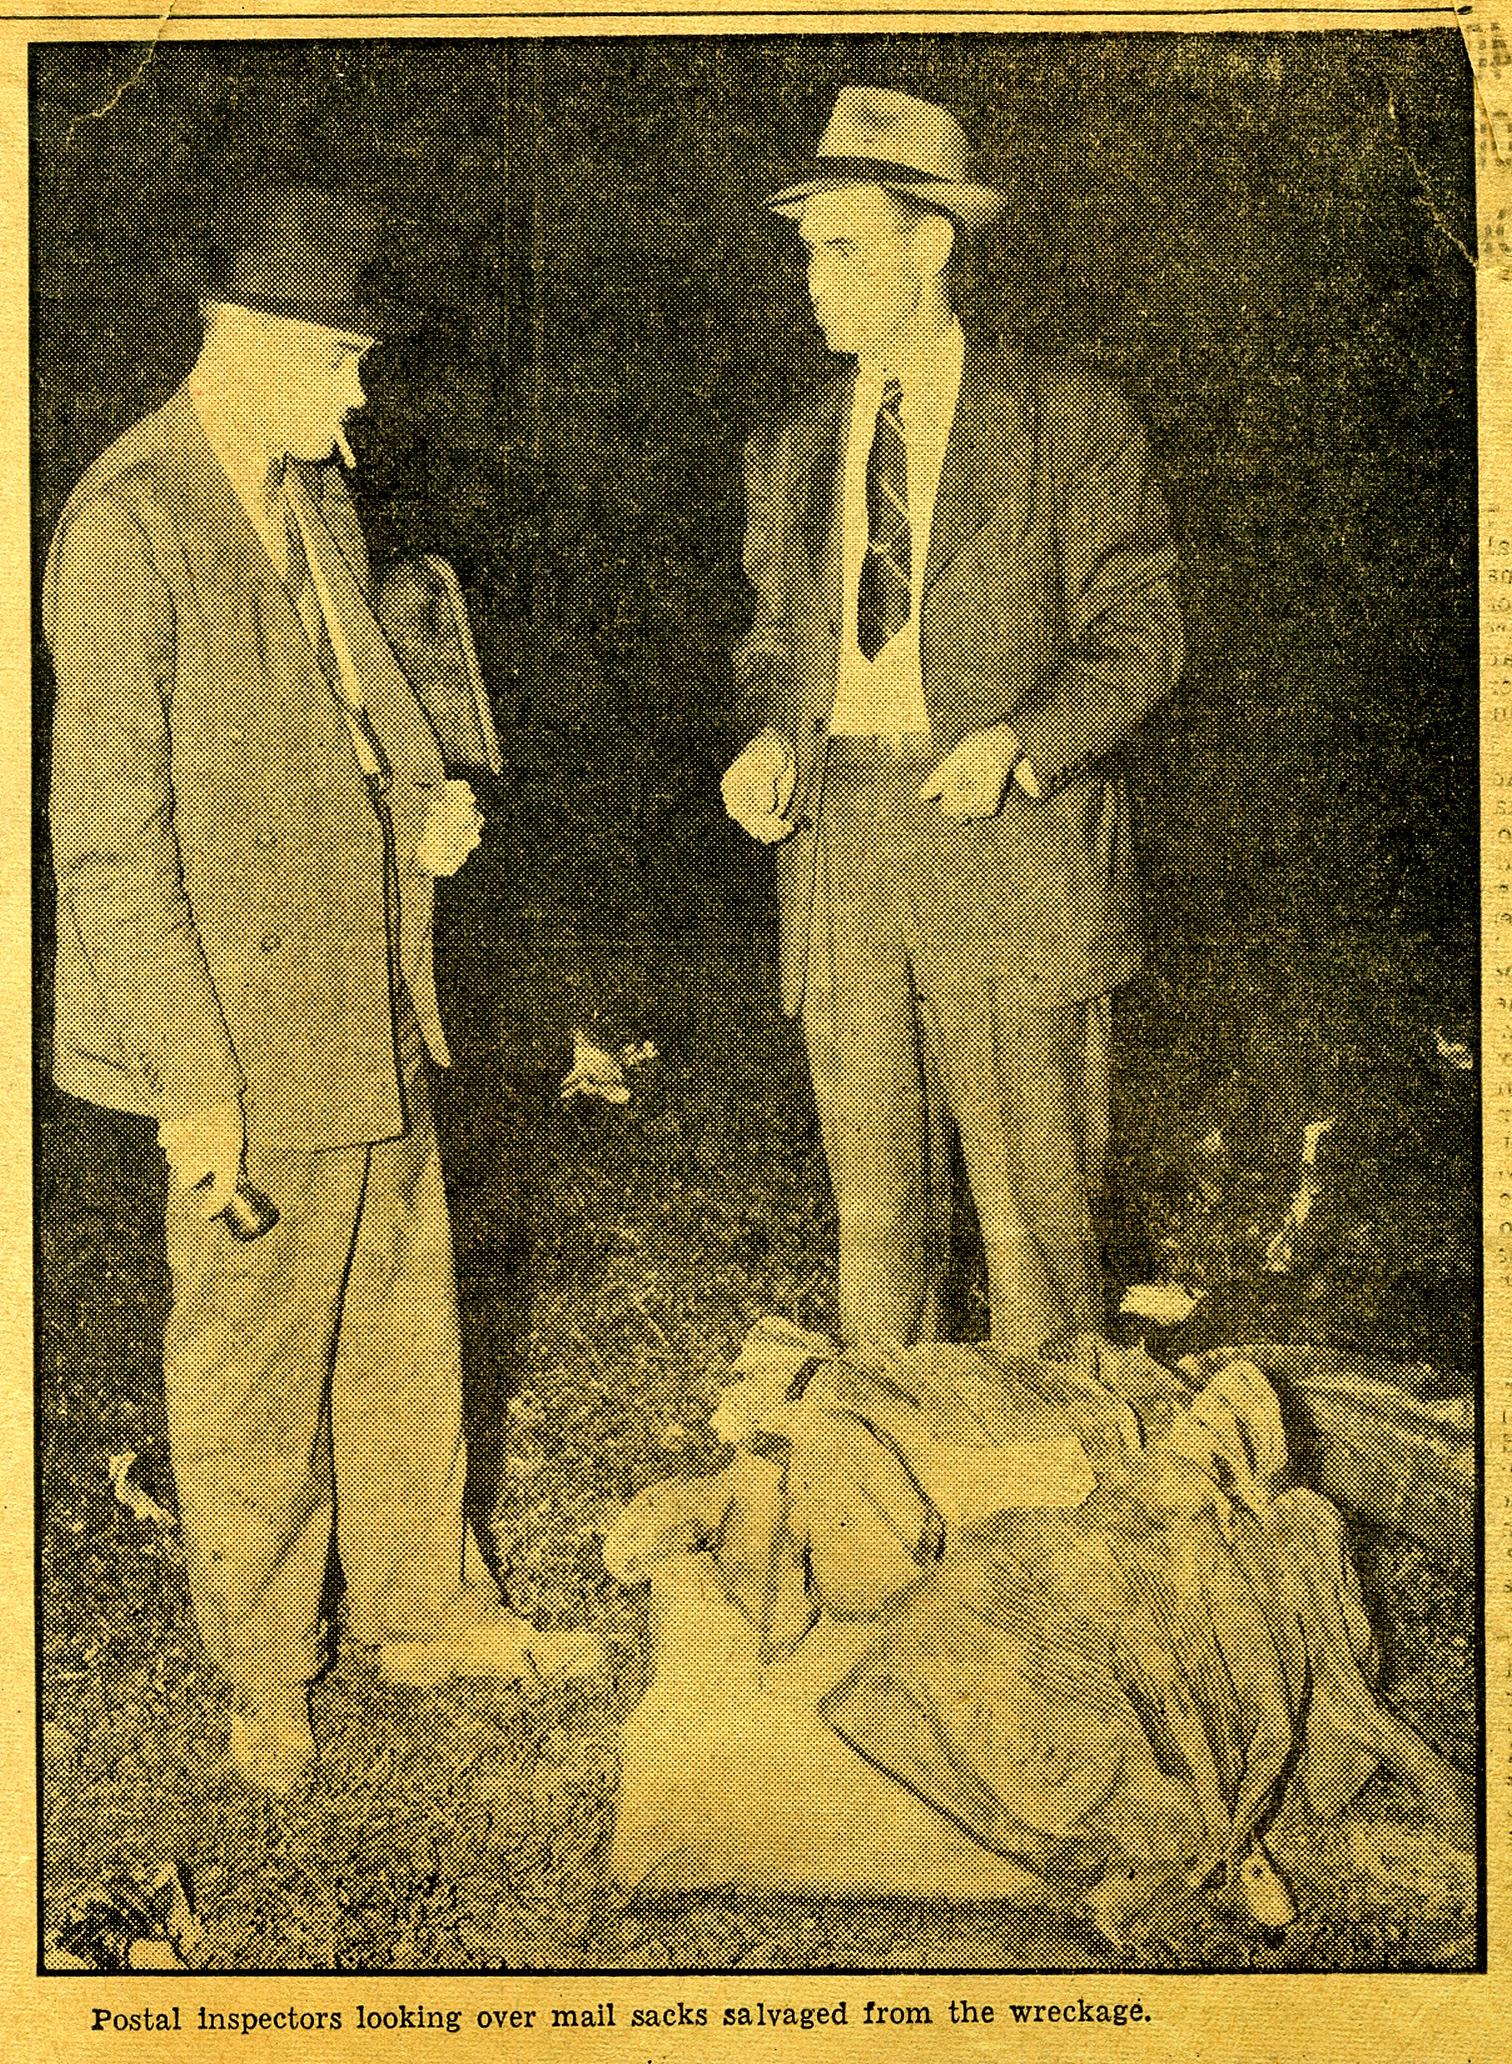 1940-09-01-postal-inspectors_washington-star-page-a3